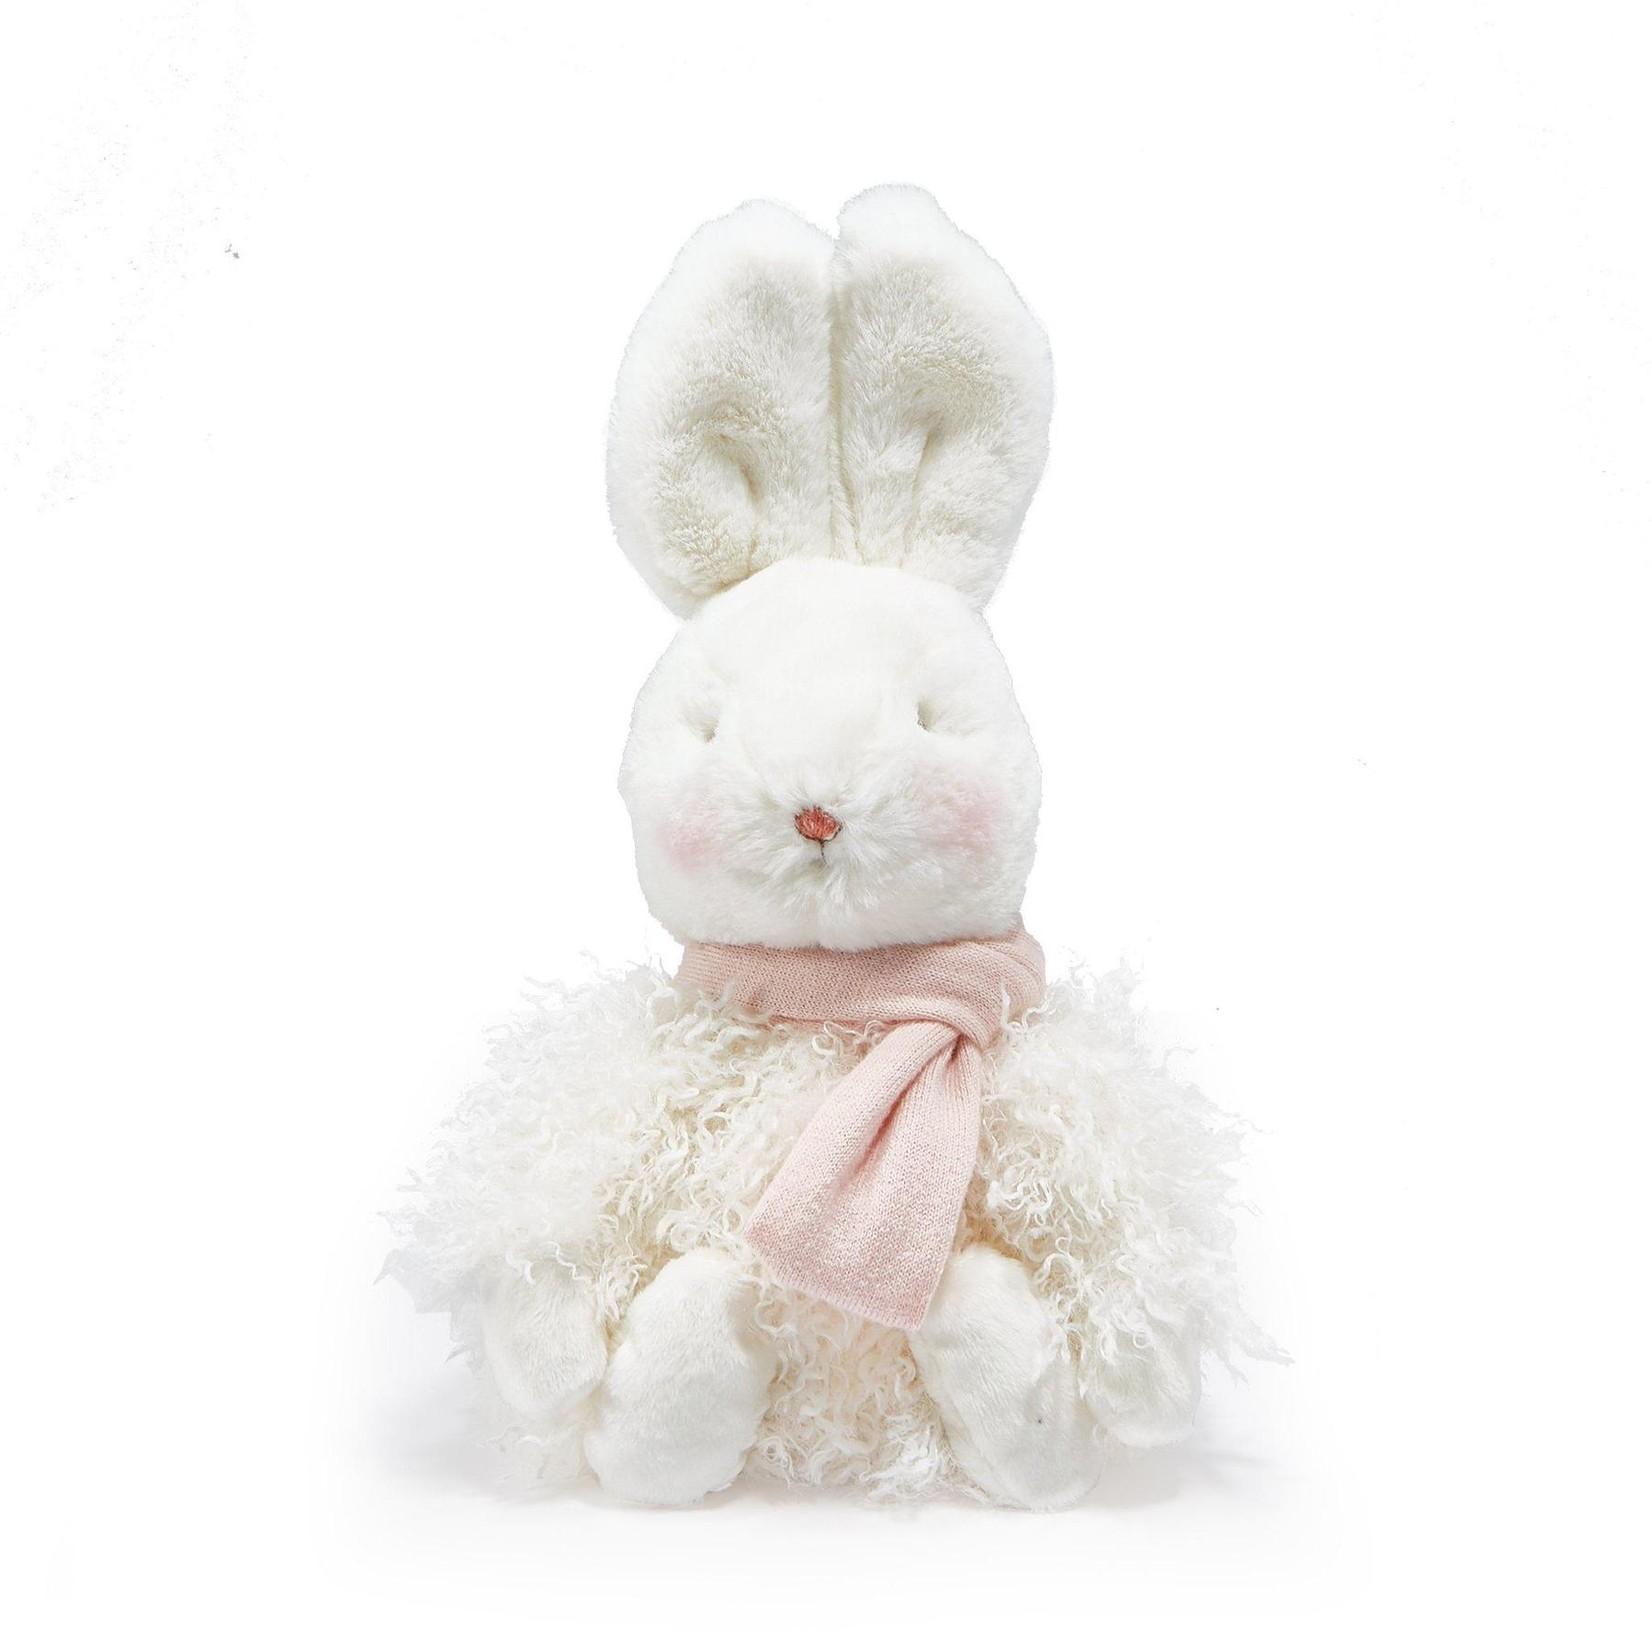 Bunnies By the Bay Aurora Angora Rabbit Stuffed Animal